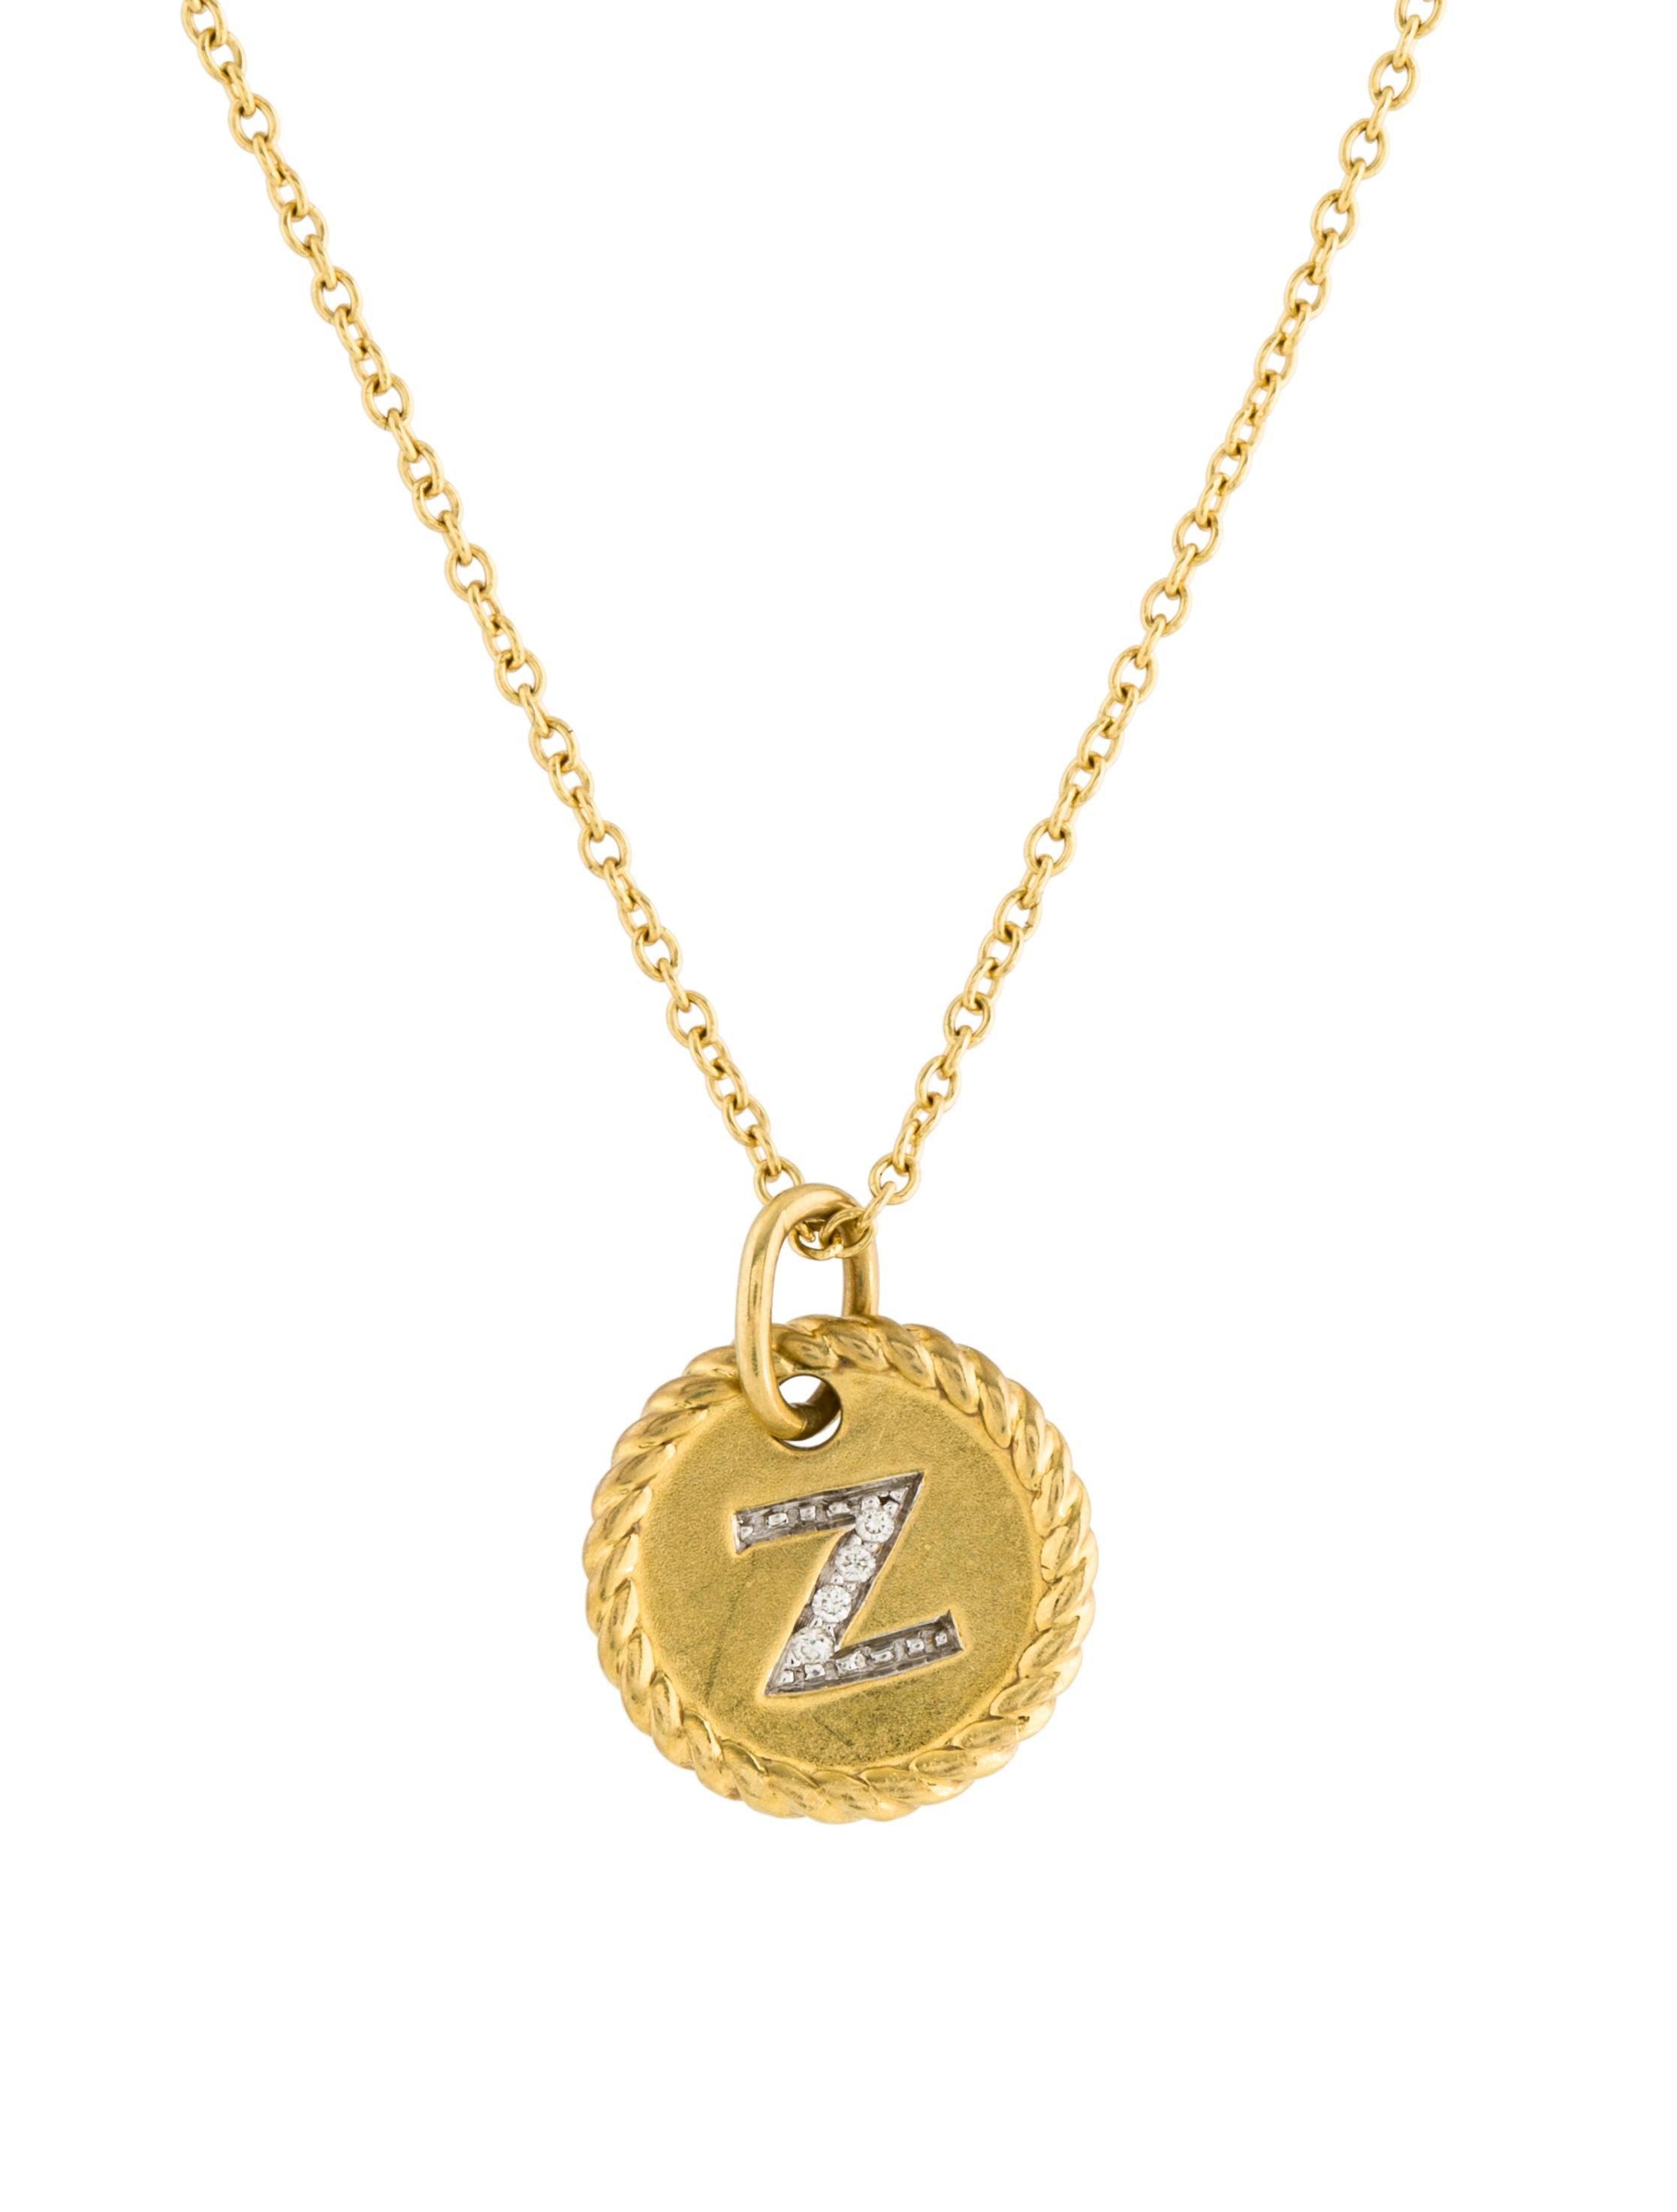 david yurman 18k initial z pendant necklace